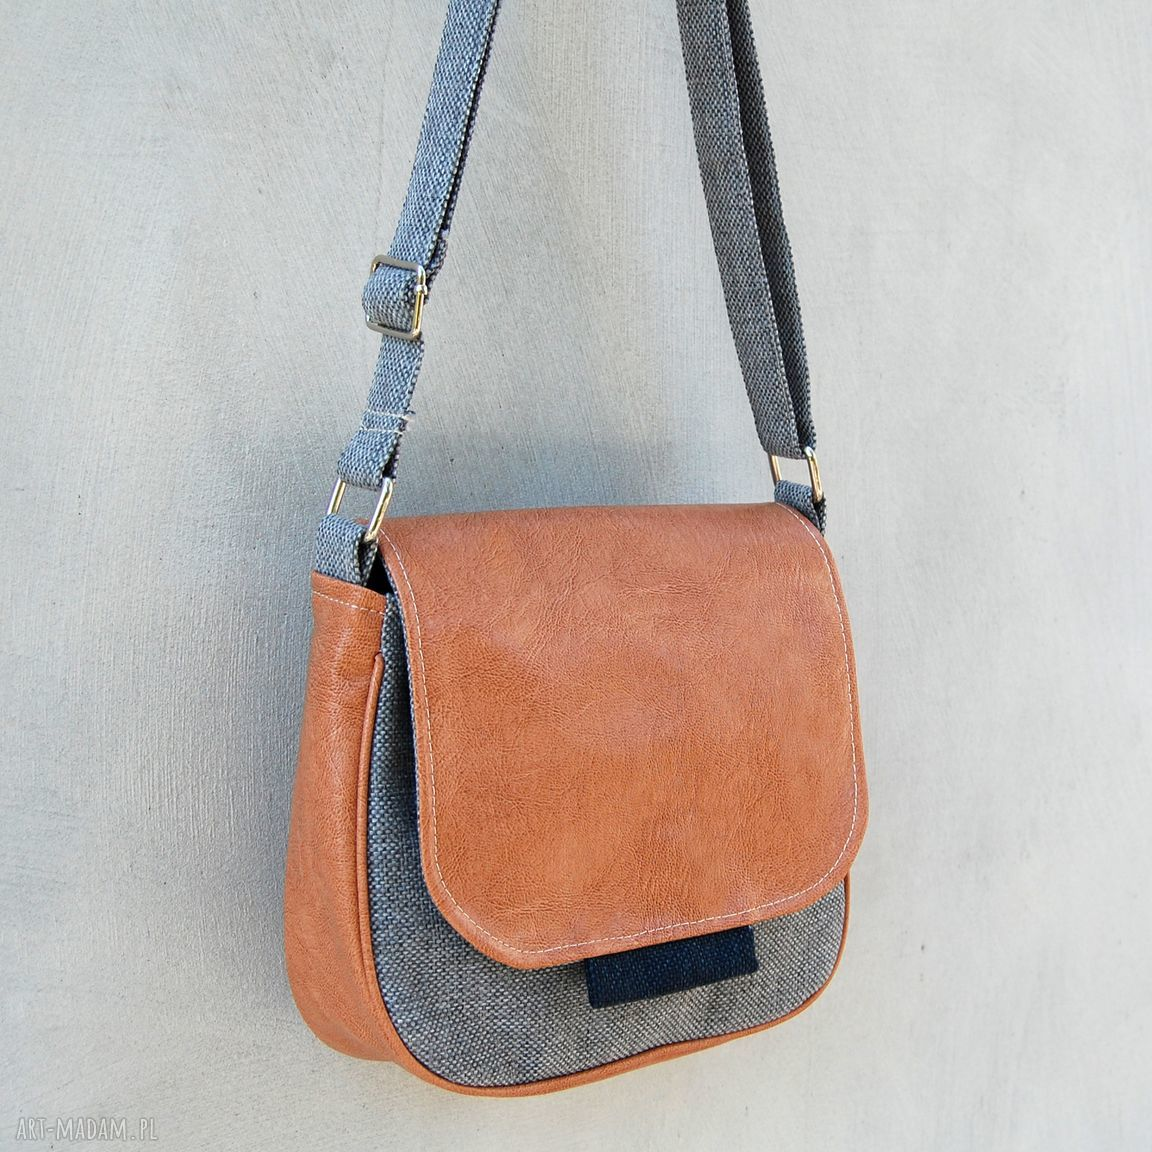 hand-made mini bambi - mała torebka - beż, szarość i granat